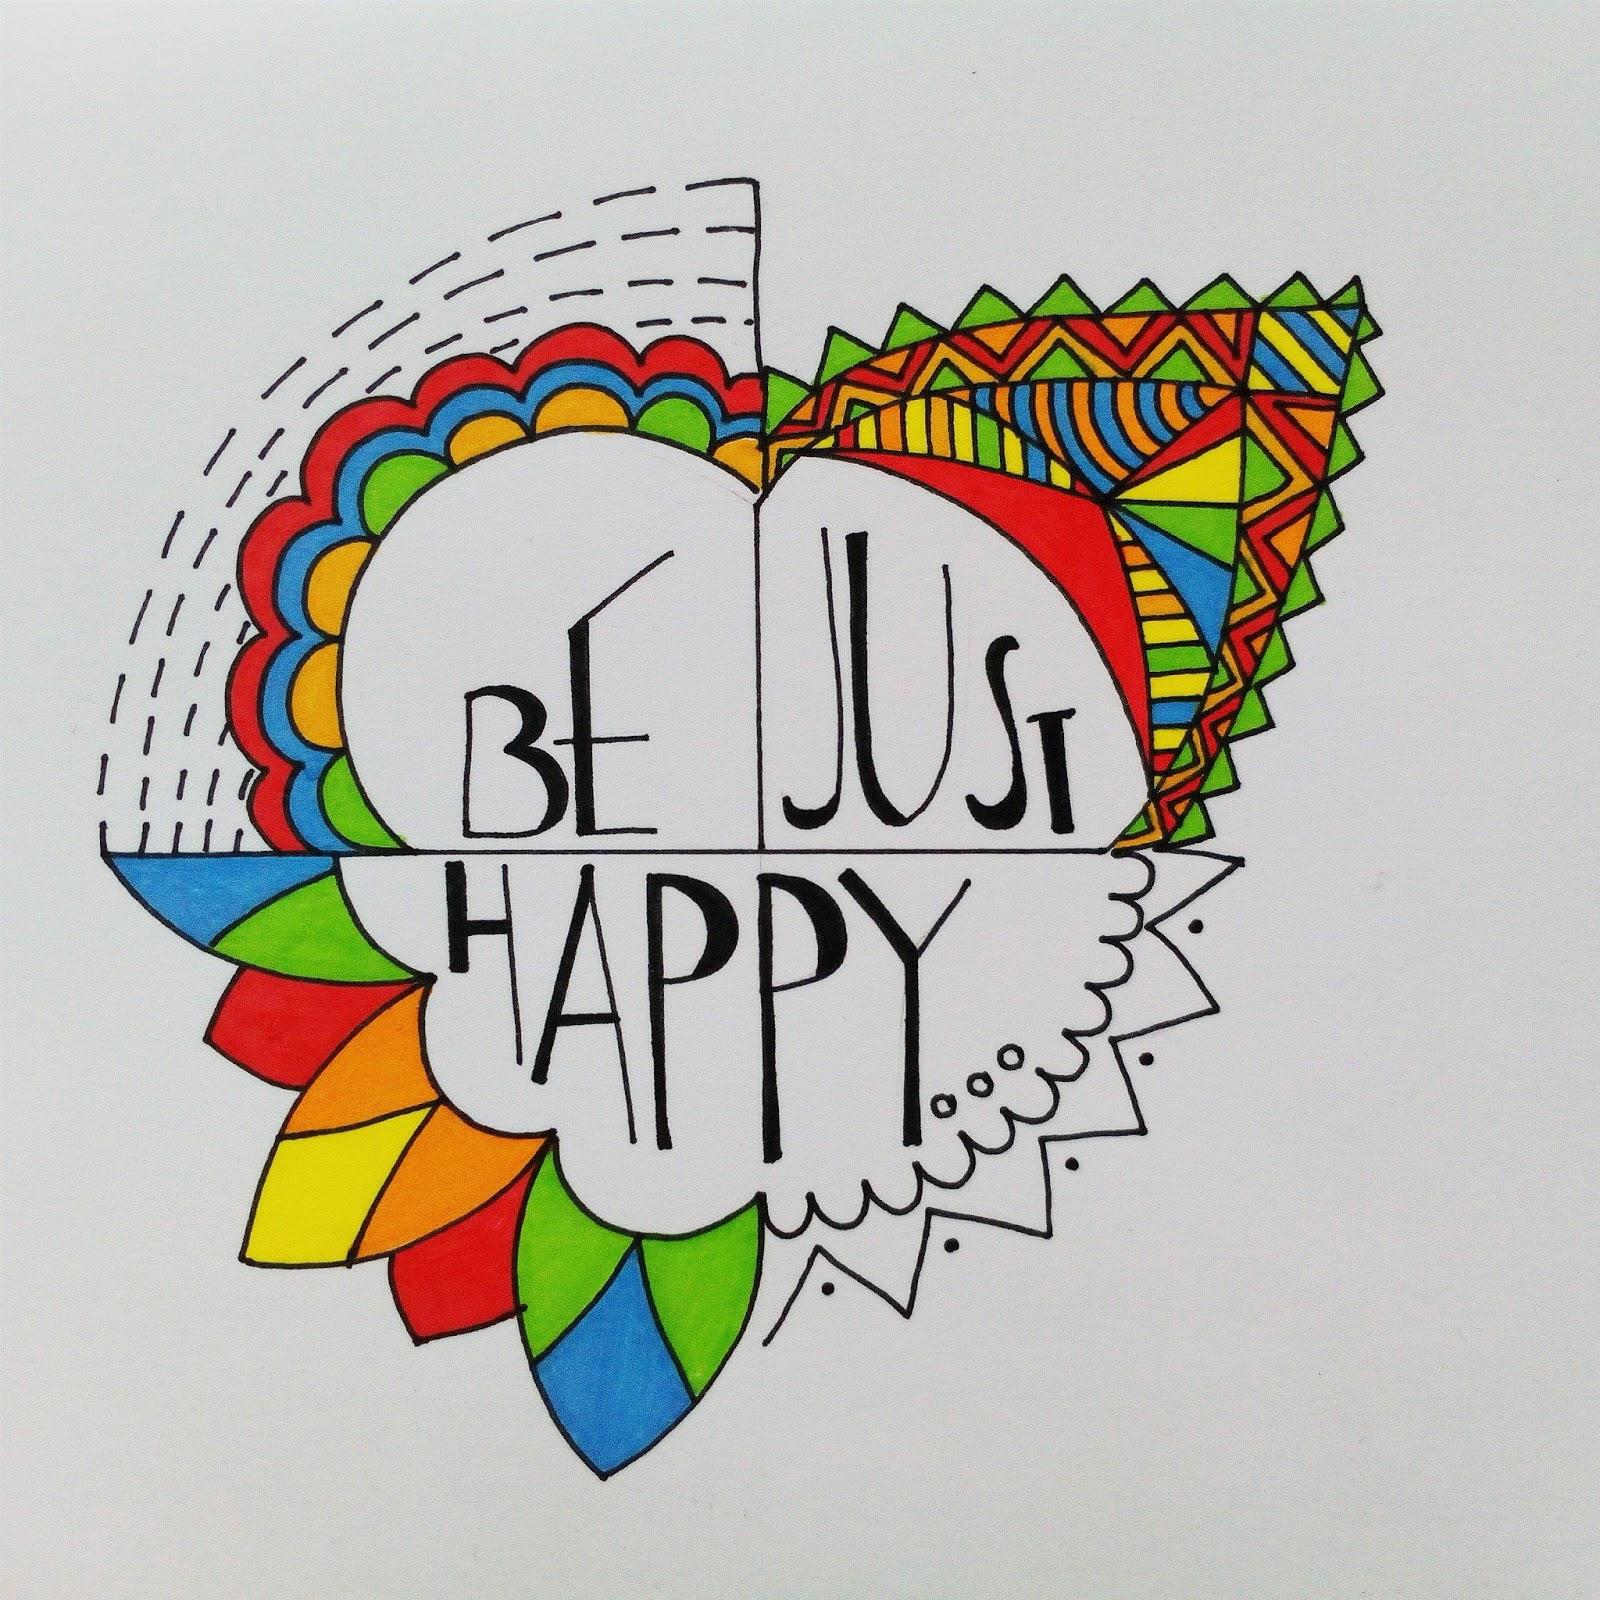 grafika Be just happy